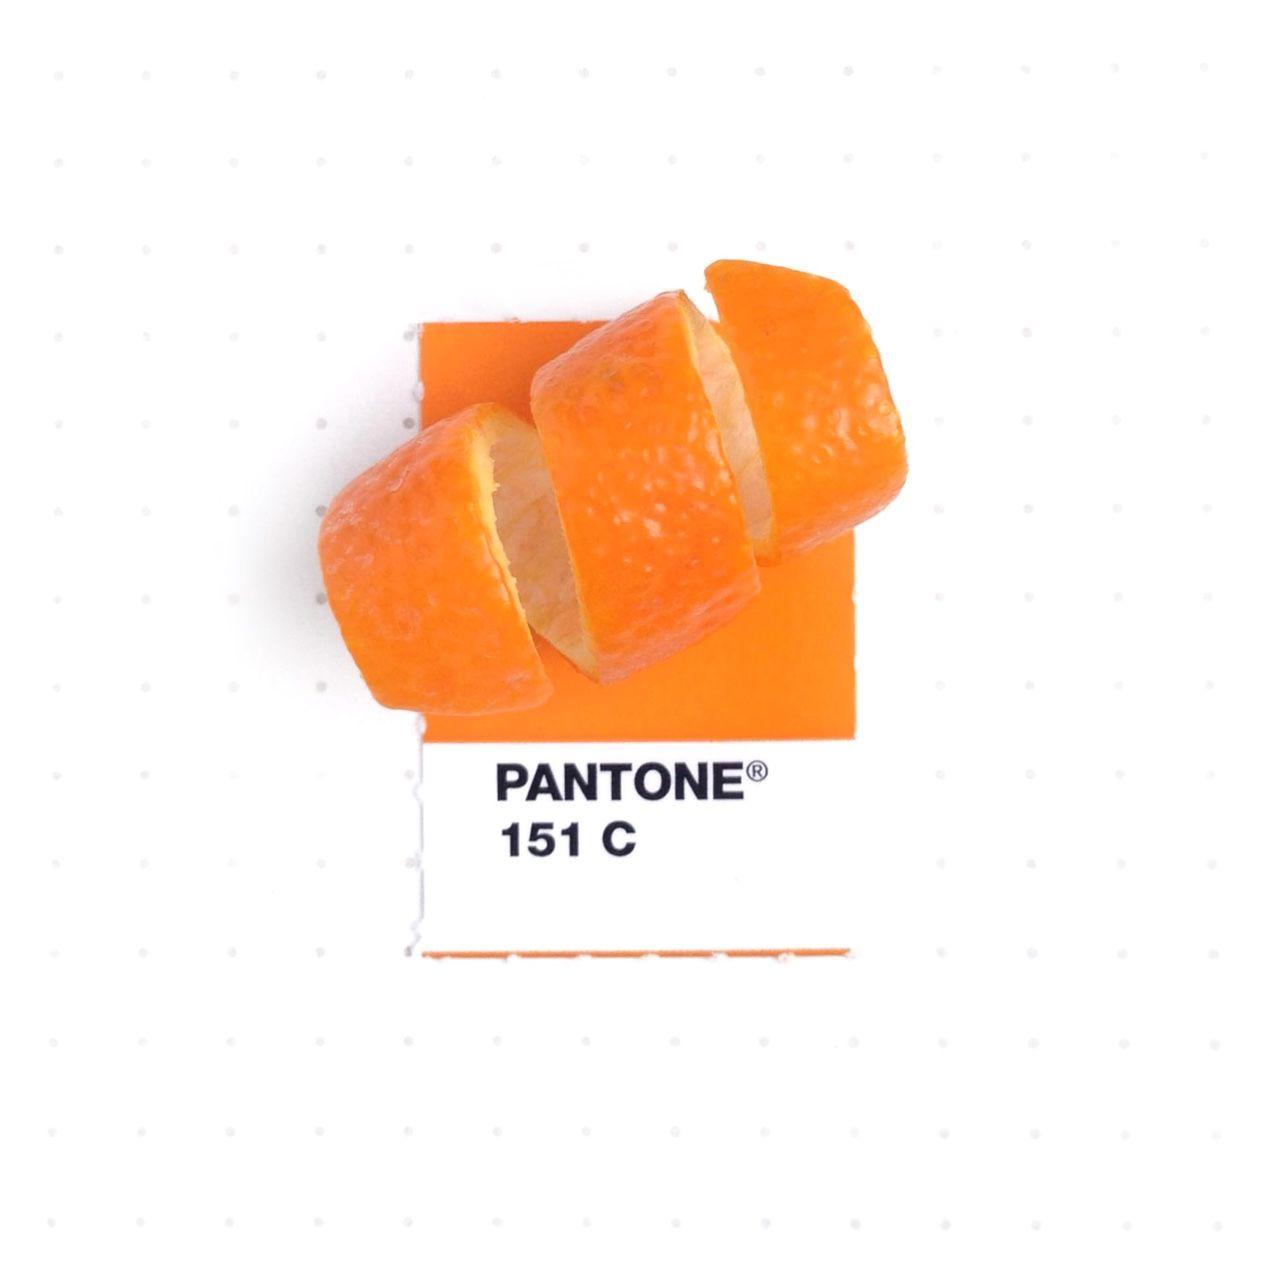 pantone 151 color match orange peel an image from my book tiny pantone color pinterest. Black Bedroom Furniture Sets. Home Design Ideas